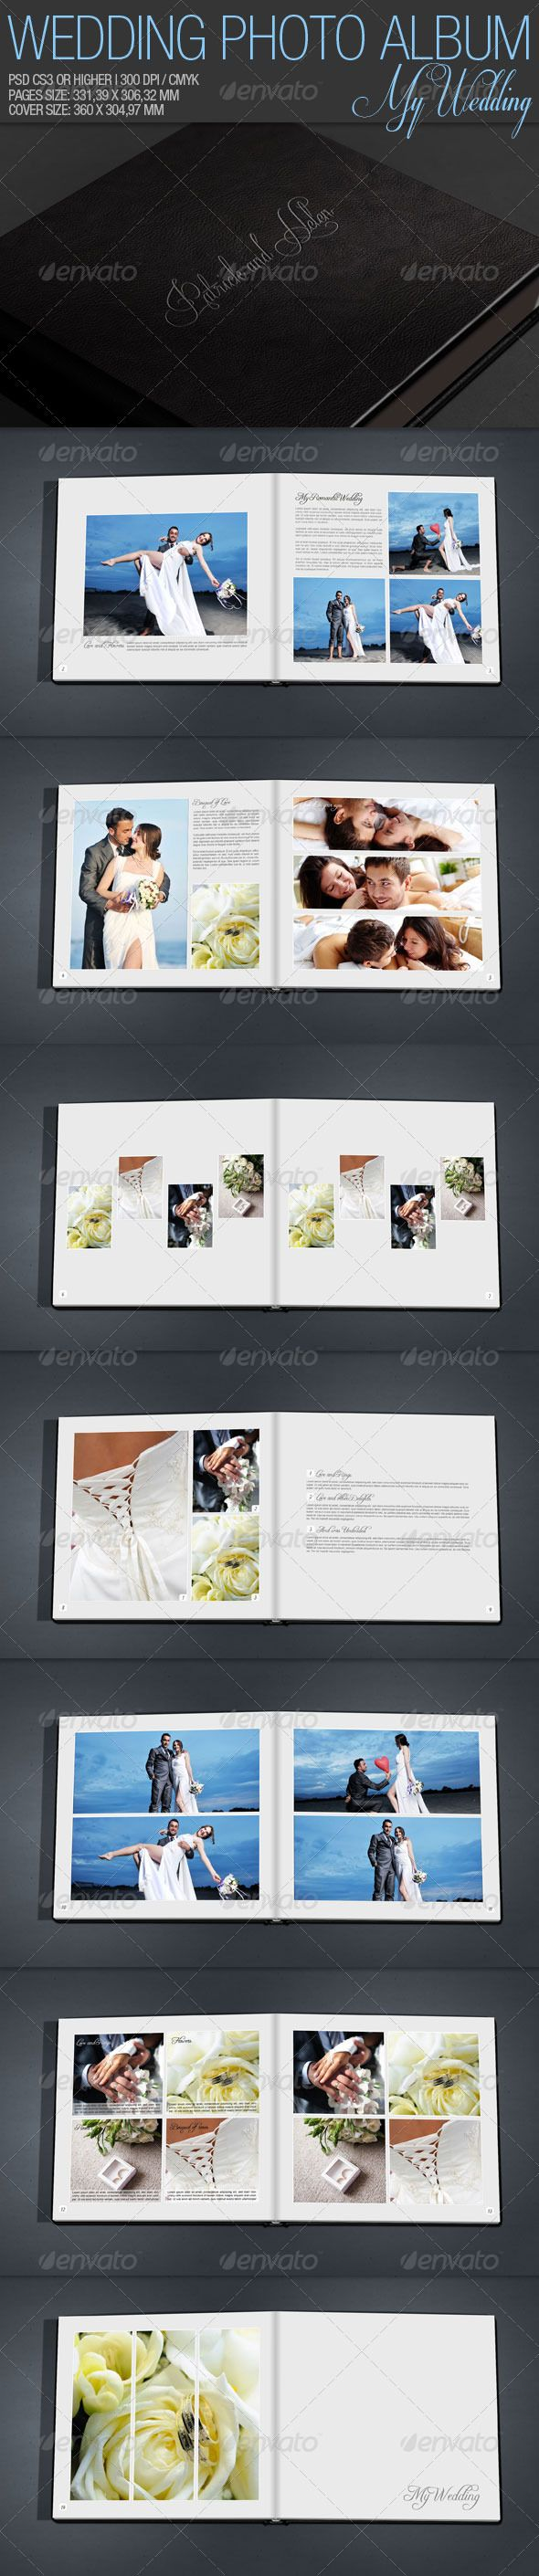 Wedding Photo Album — Photoshop PSD #b&w #photography • Available here → https://graphicriver.net/item/wedding-photo-album/1947187?ref=pxcr